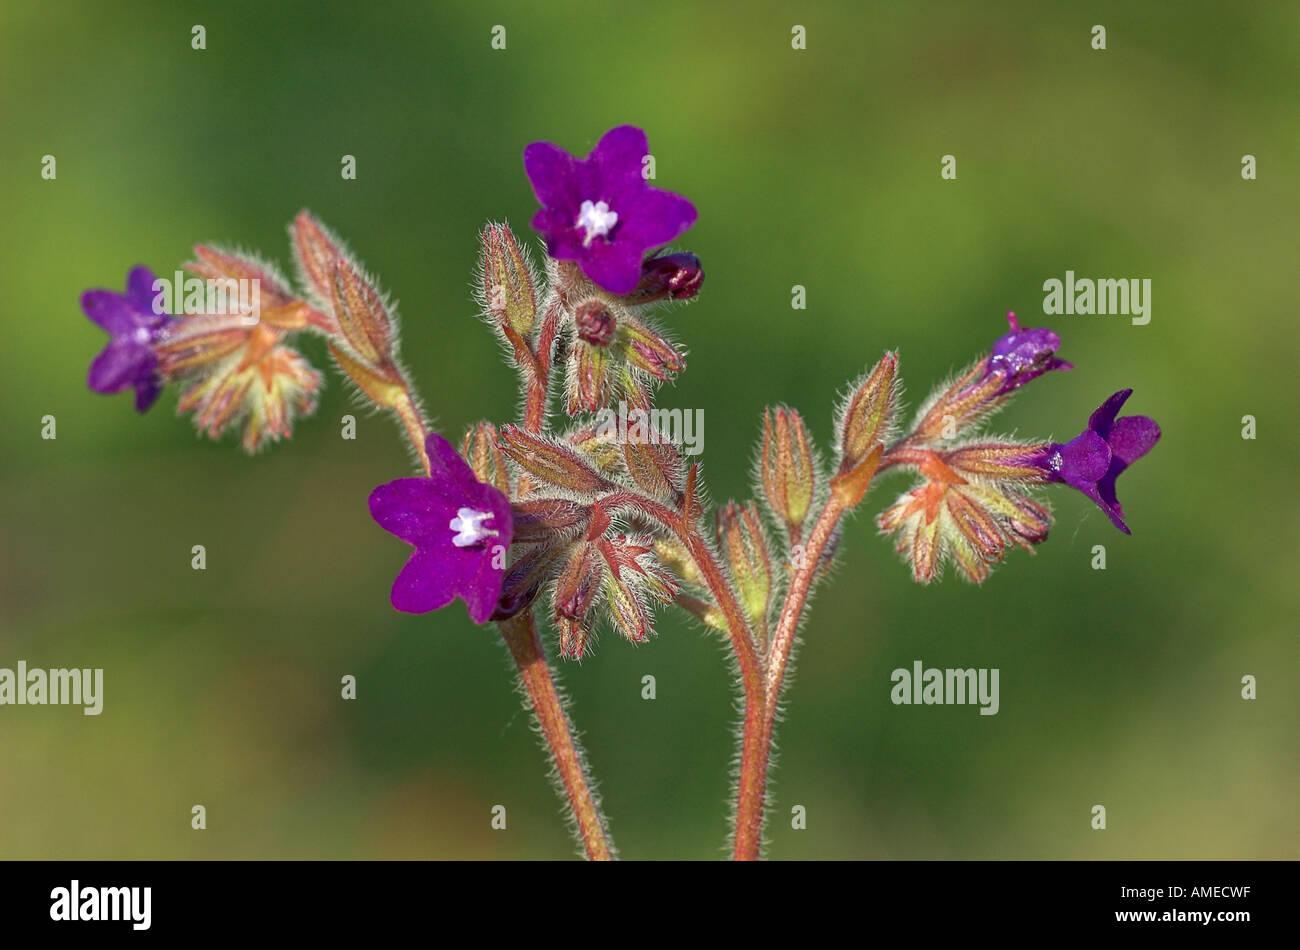 common bugloss, common alkanet (Anchusa officinalis), inflorescences, Bulgaria, Suedost-Bulgarien, Kresna - Stock Image